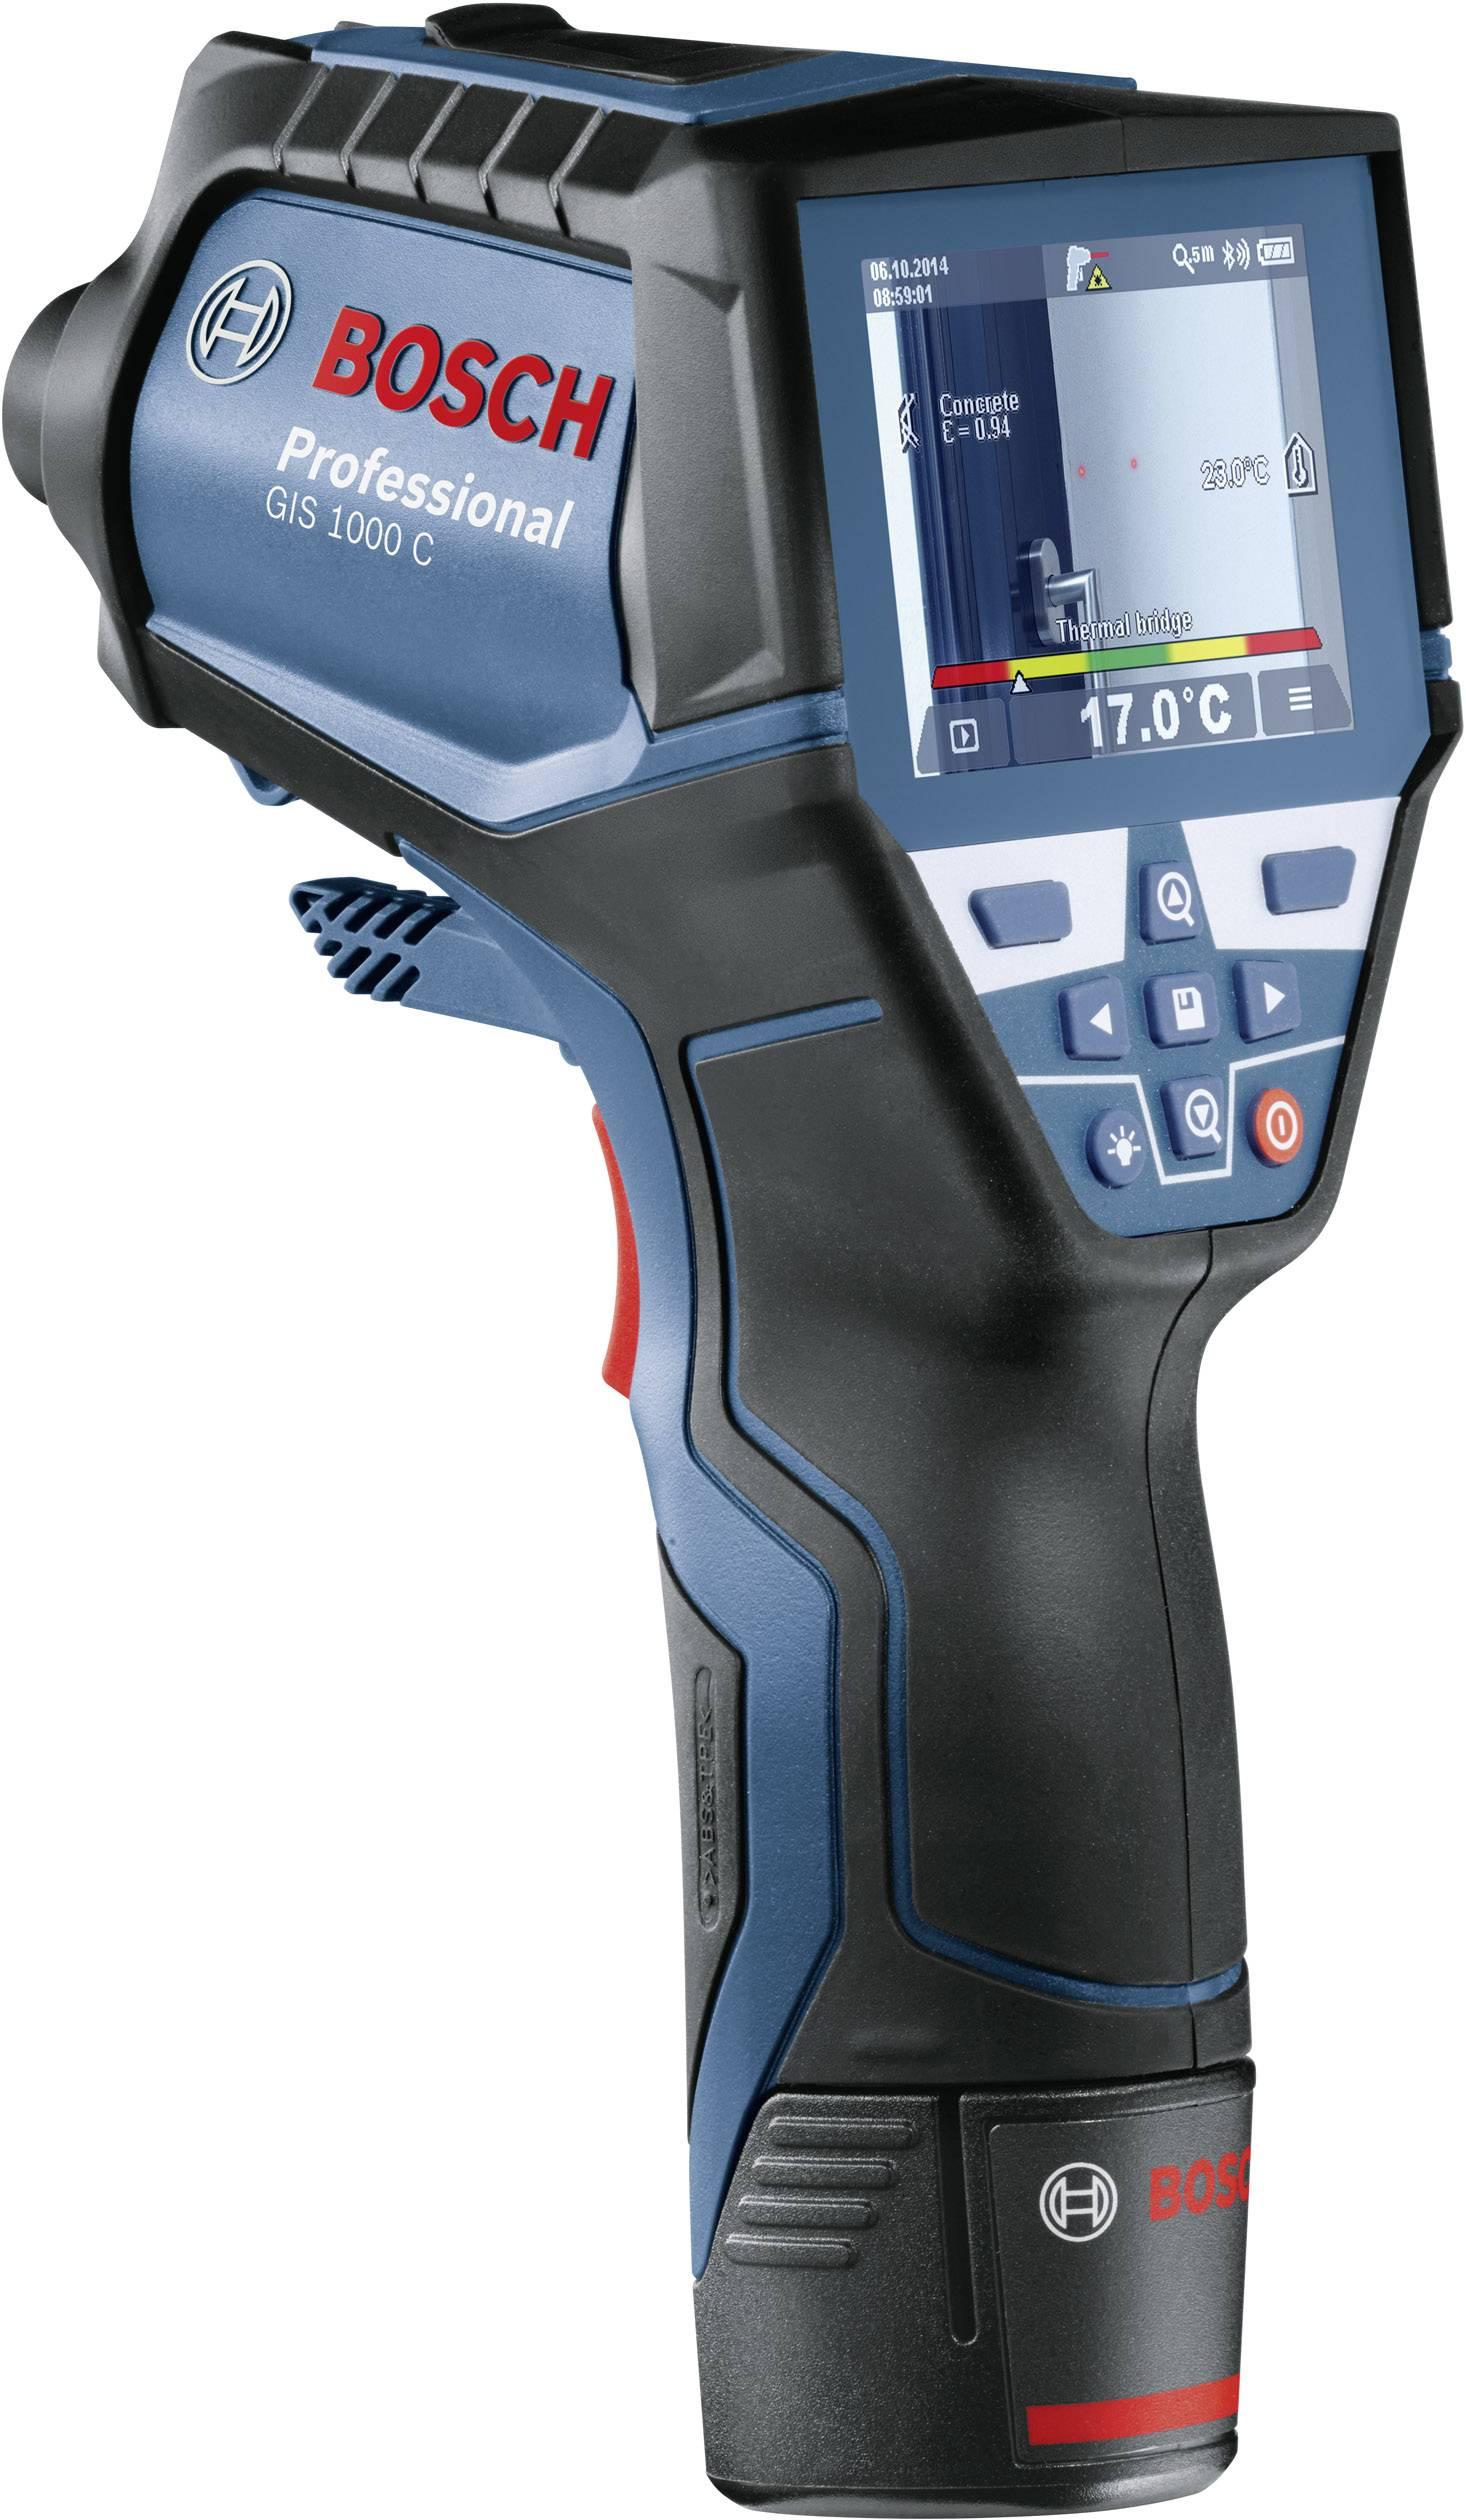 Infračervený teplomer Bosch Professional GIS 1000 C, Optika 50:1, -40 do 1000 °C